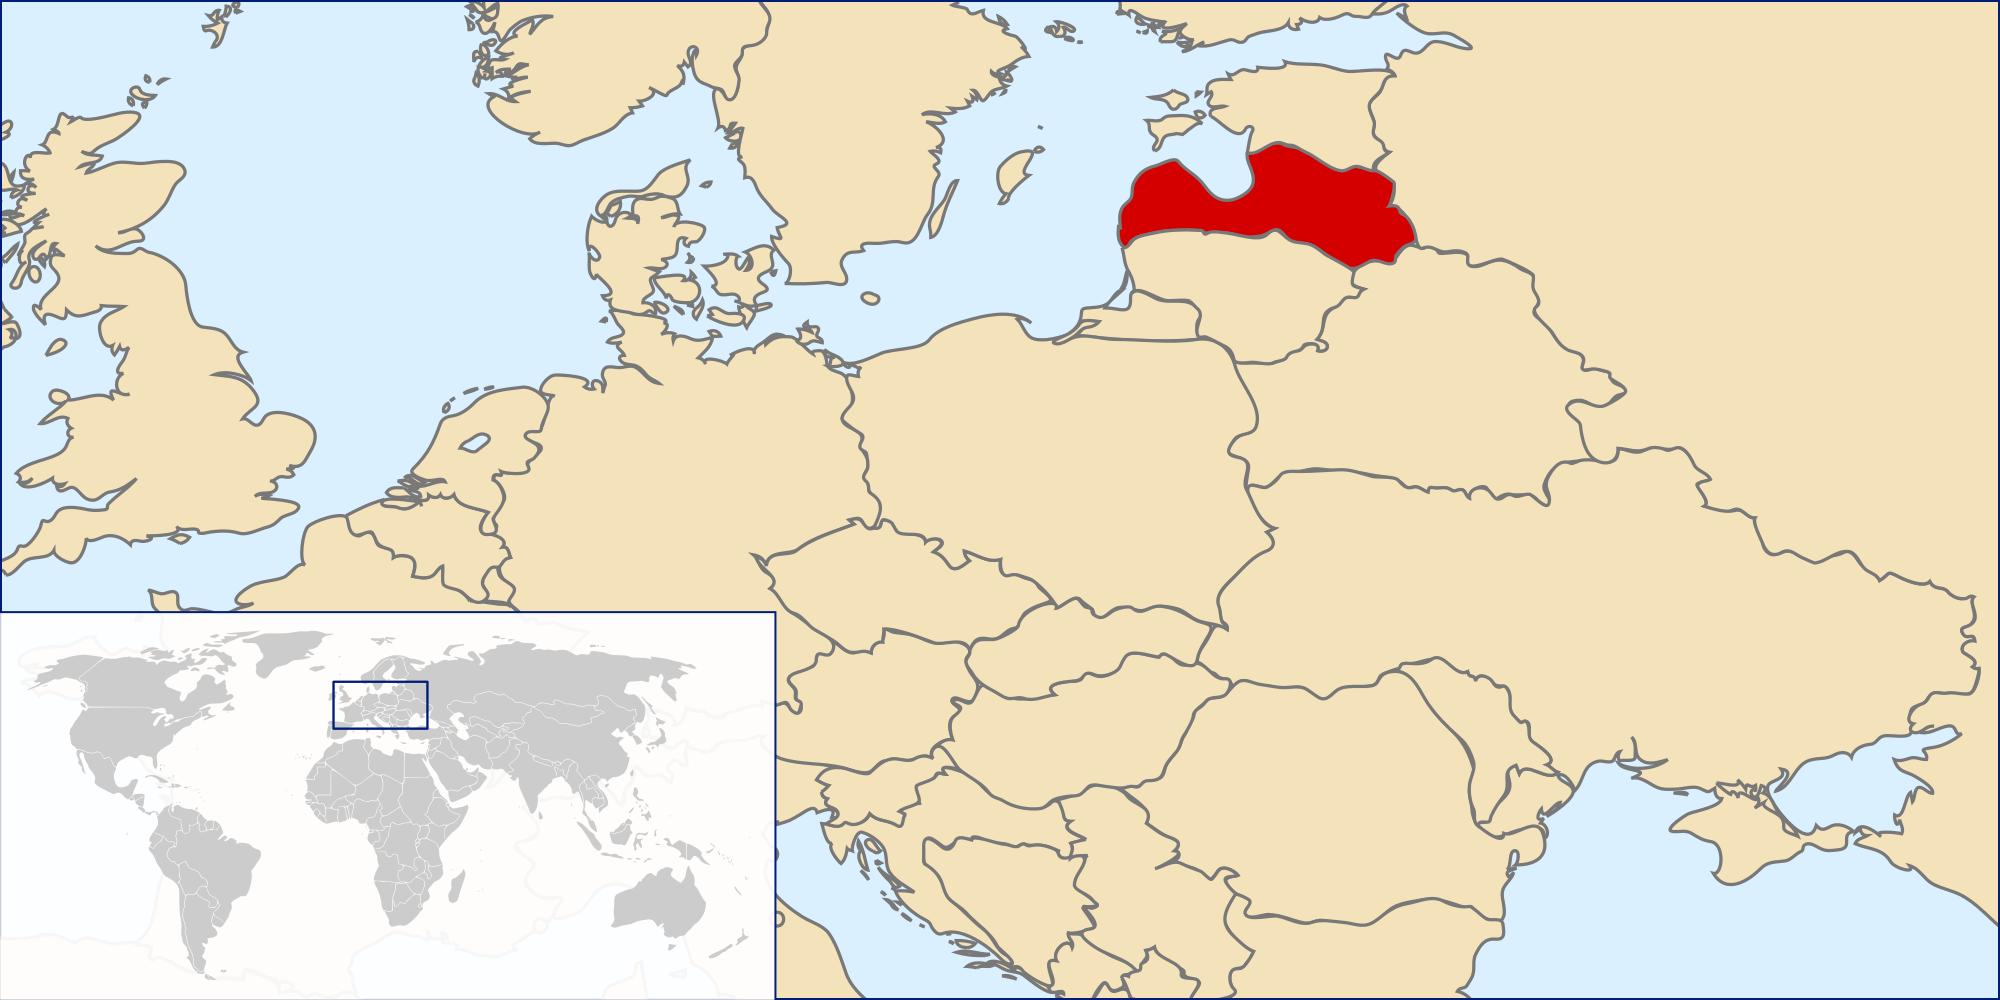 Tratamentul comun al Letoniei